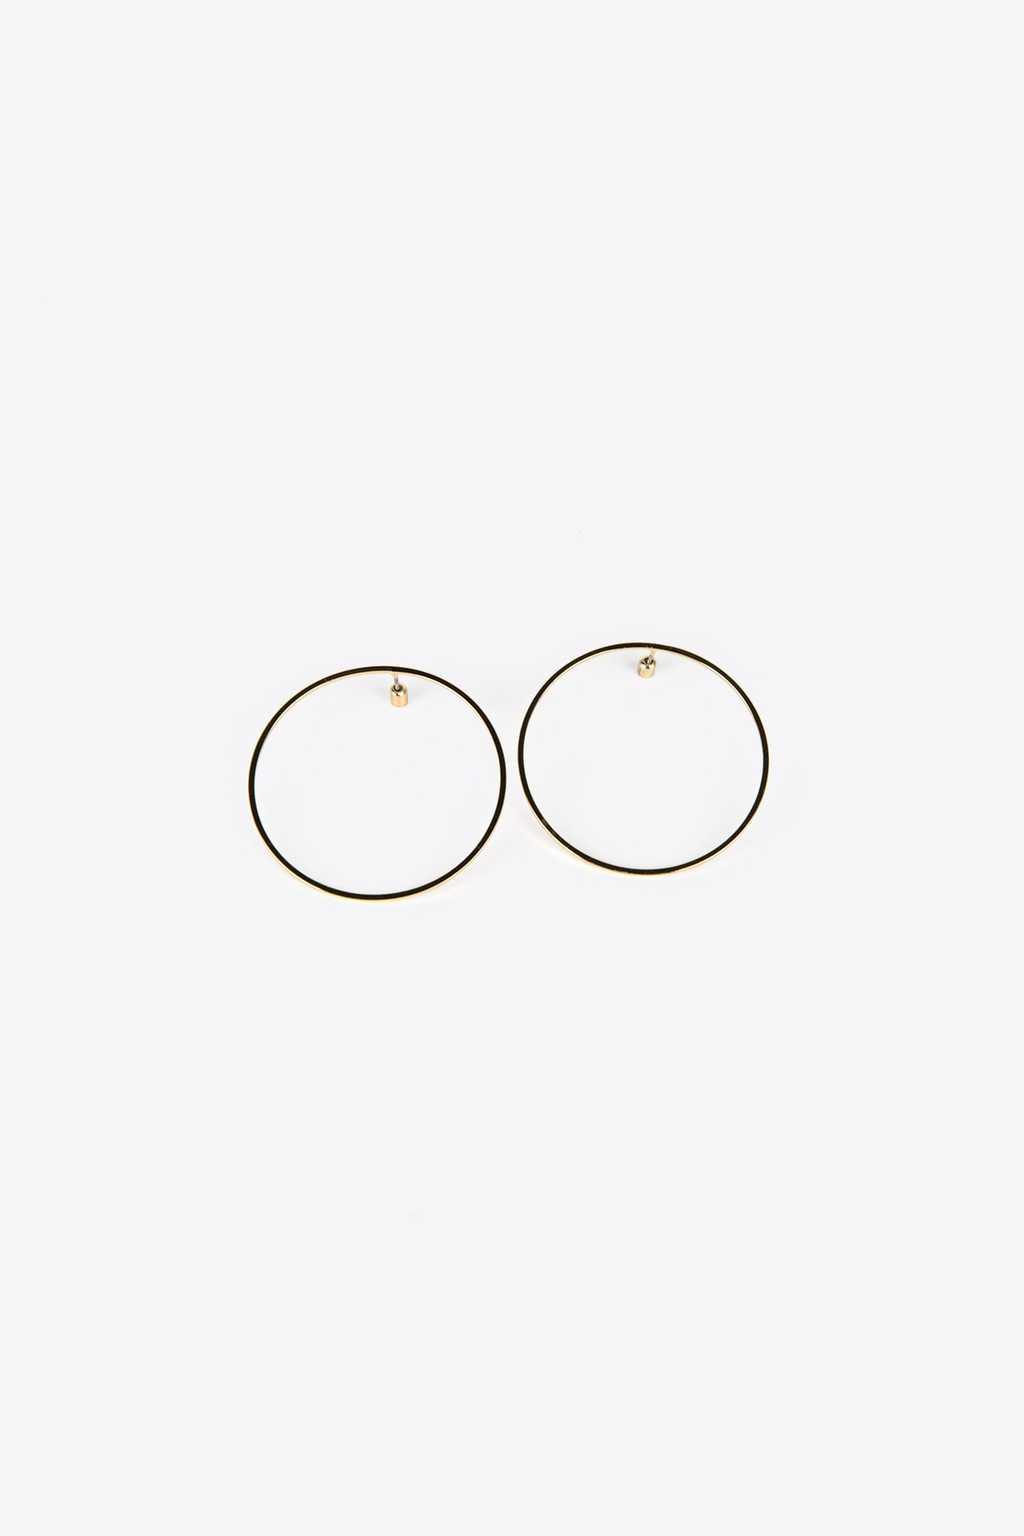 Earring 1800 Gold 1